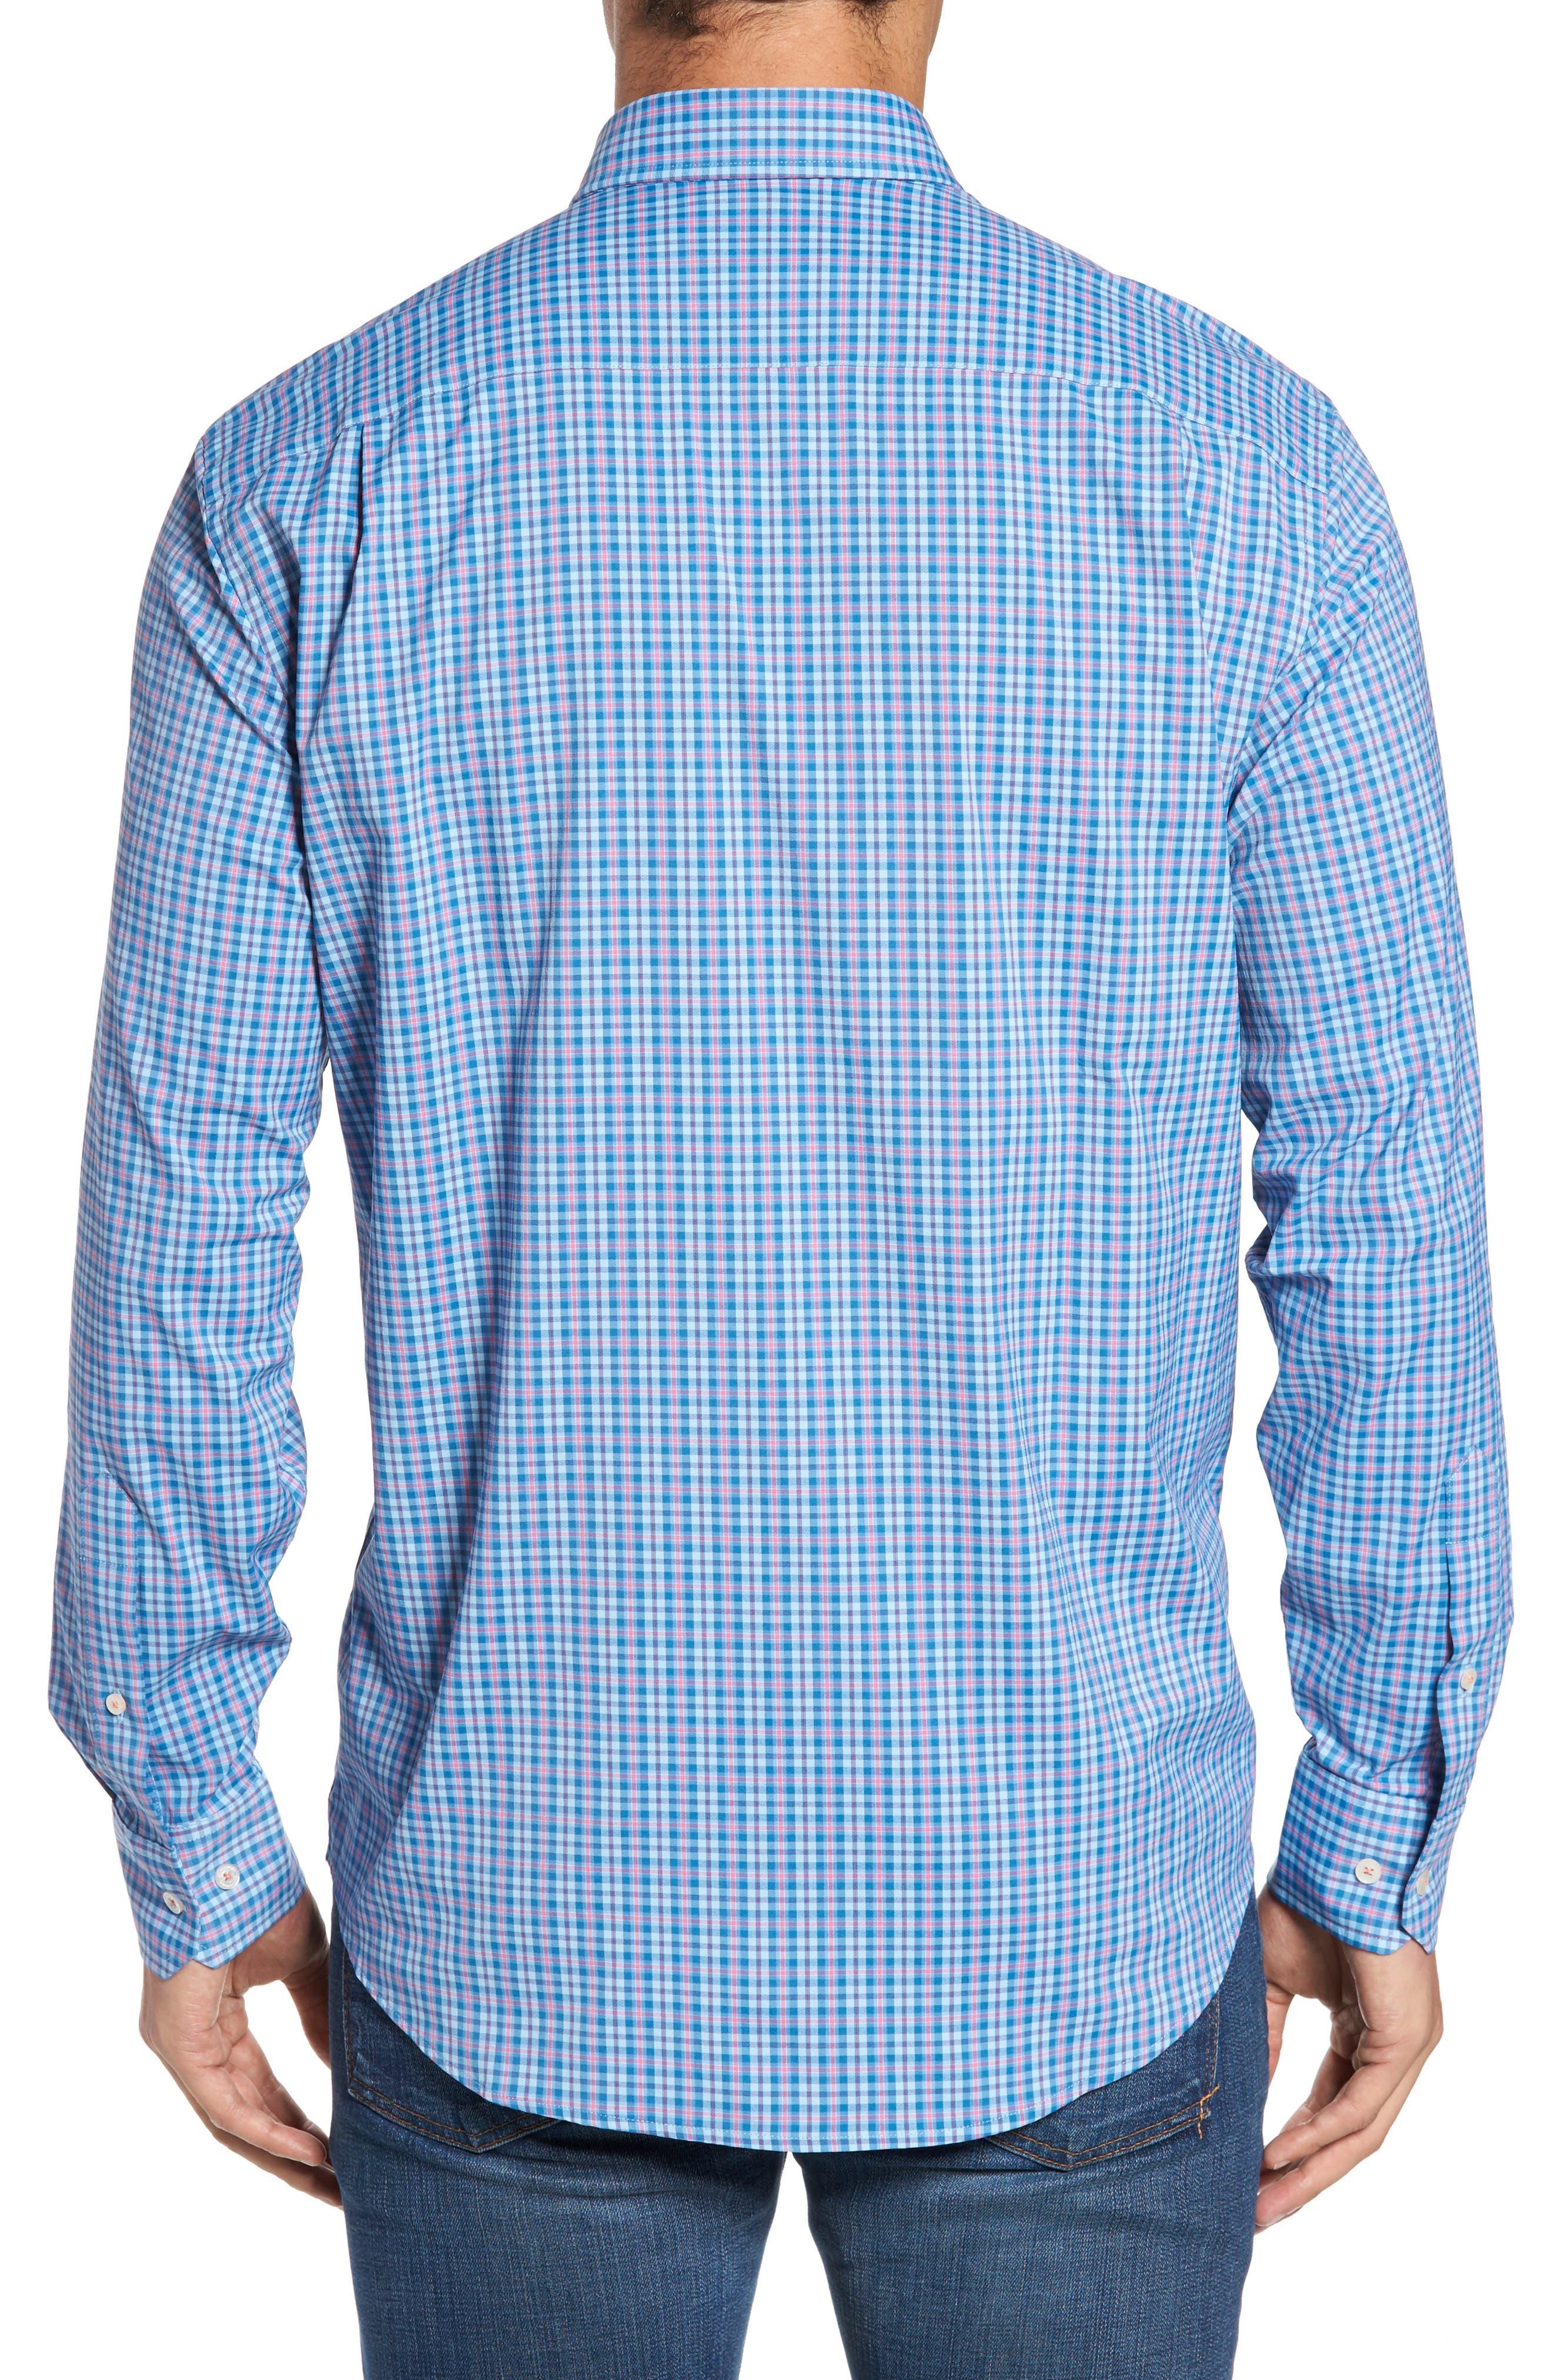 Intercoastal Regular Fit Bayview Plaid Performance Sport Shirt,                             Alternate thumbnail 2, color,                             416